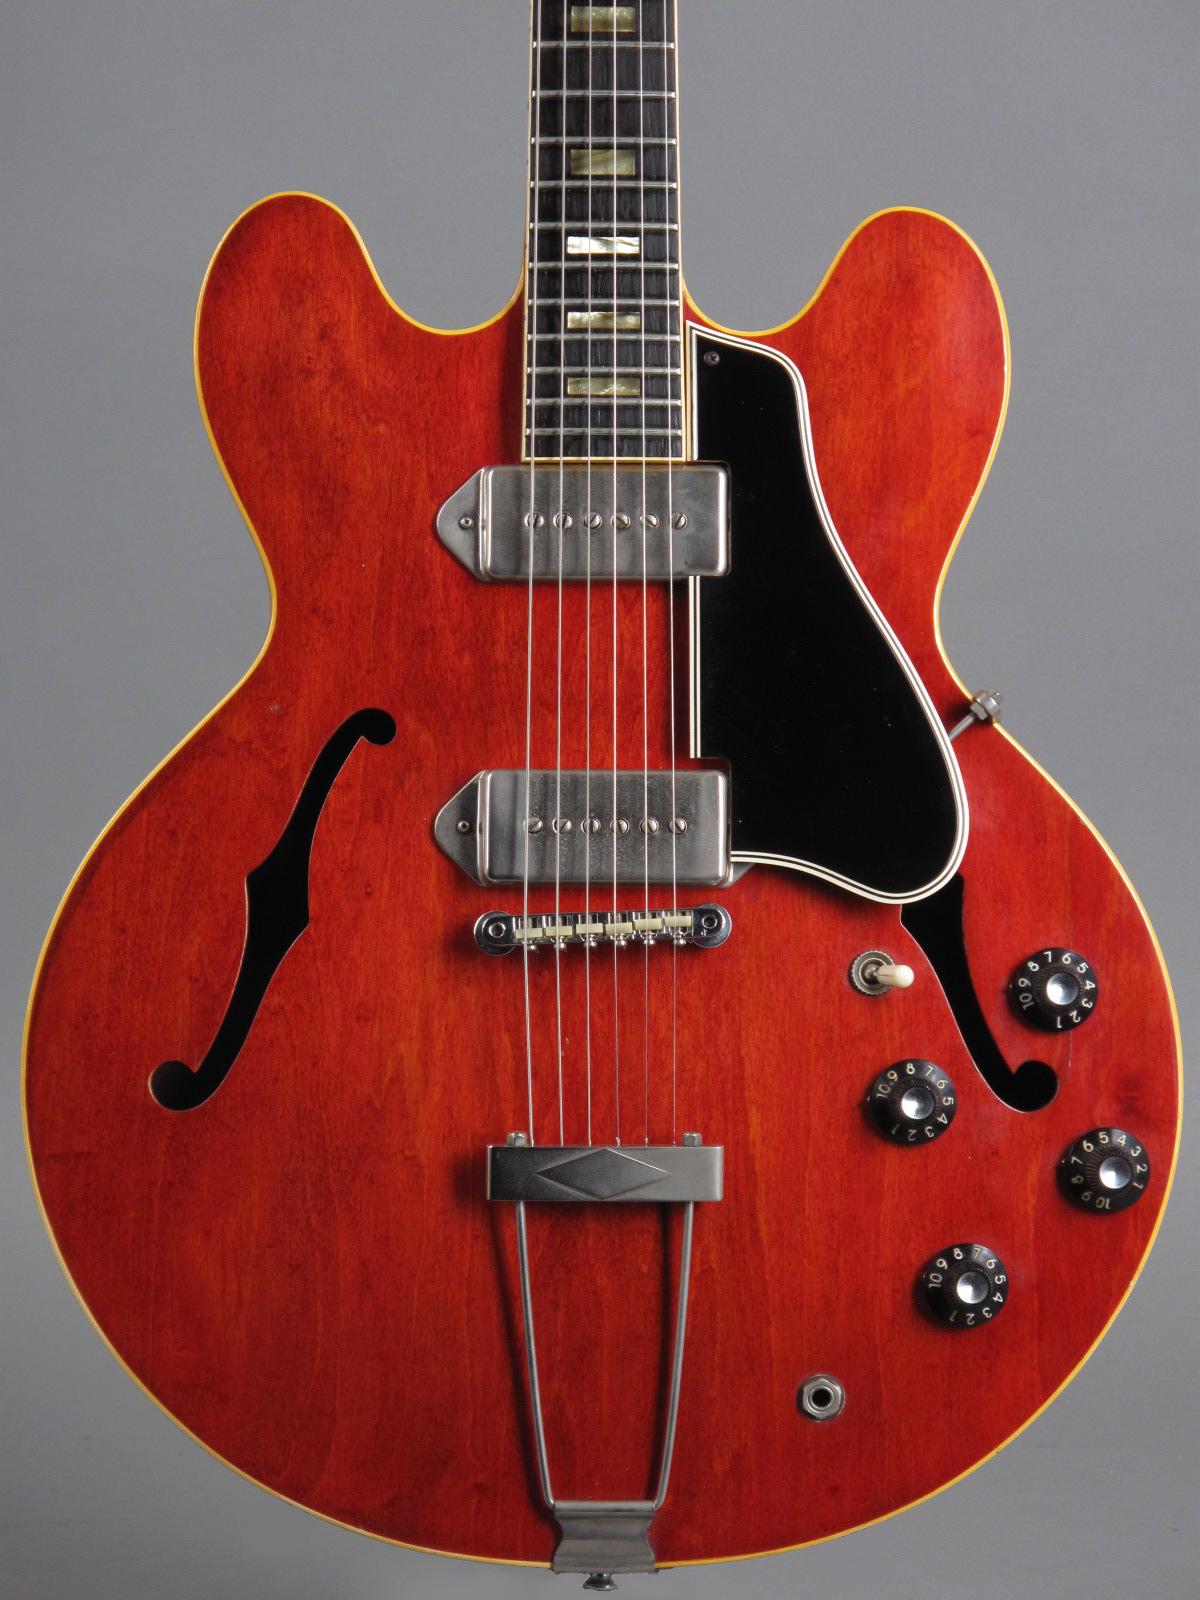 1963 Gibson ES-330 TDC - Cherry